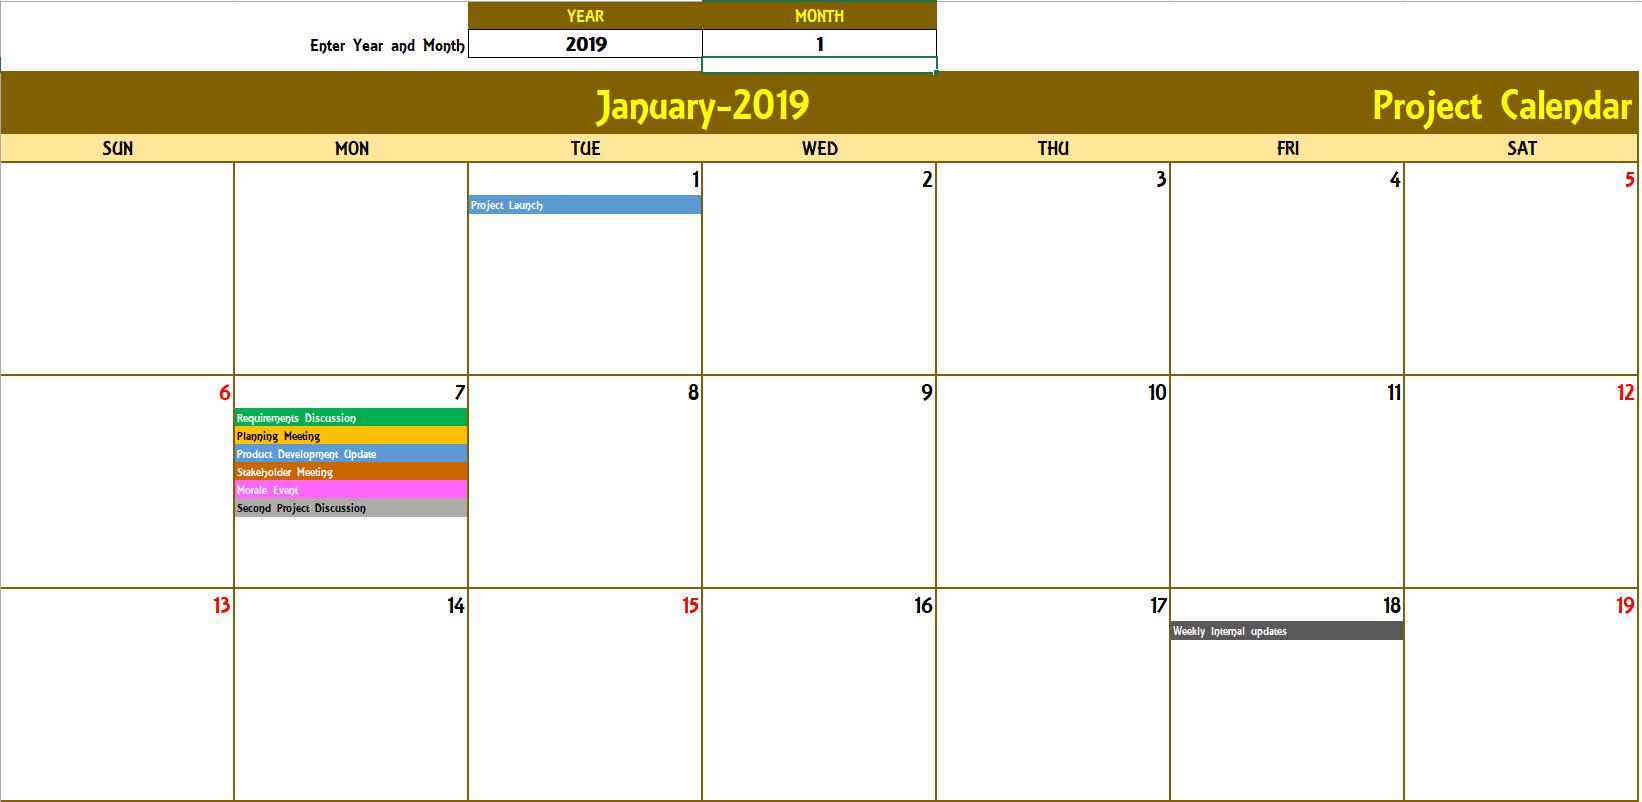 Excel Calendar Template - Excel Calendar 2019, 2020 Or Any Year in Event Calendar Templates Excel Printable